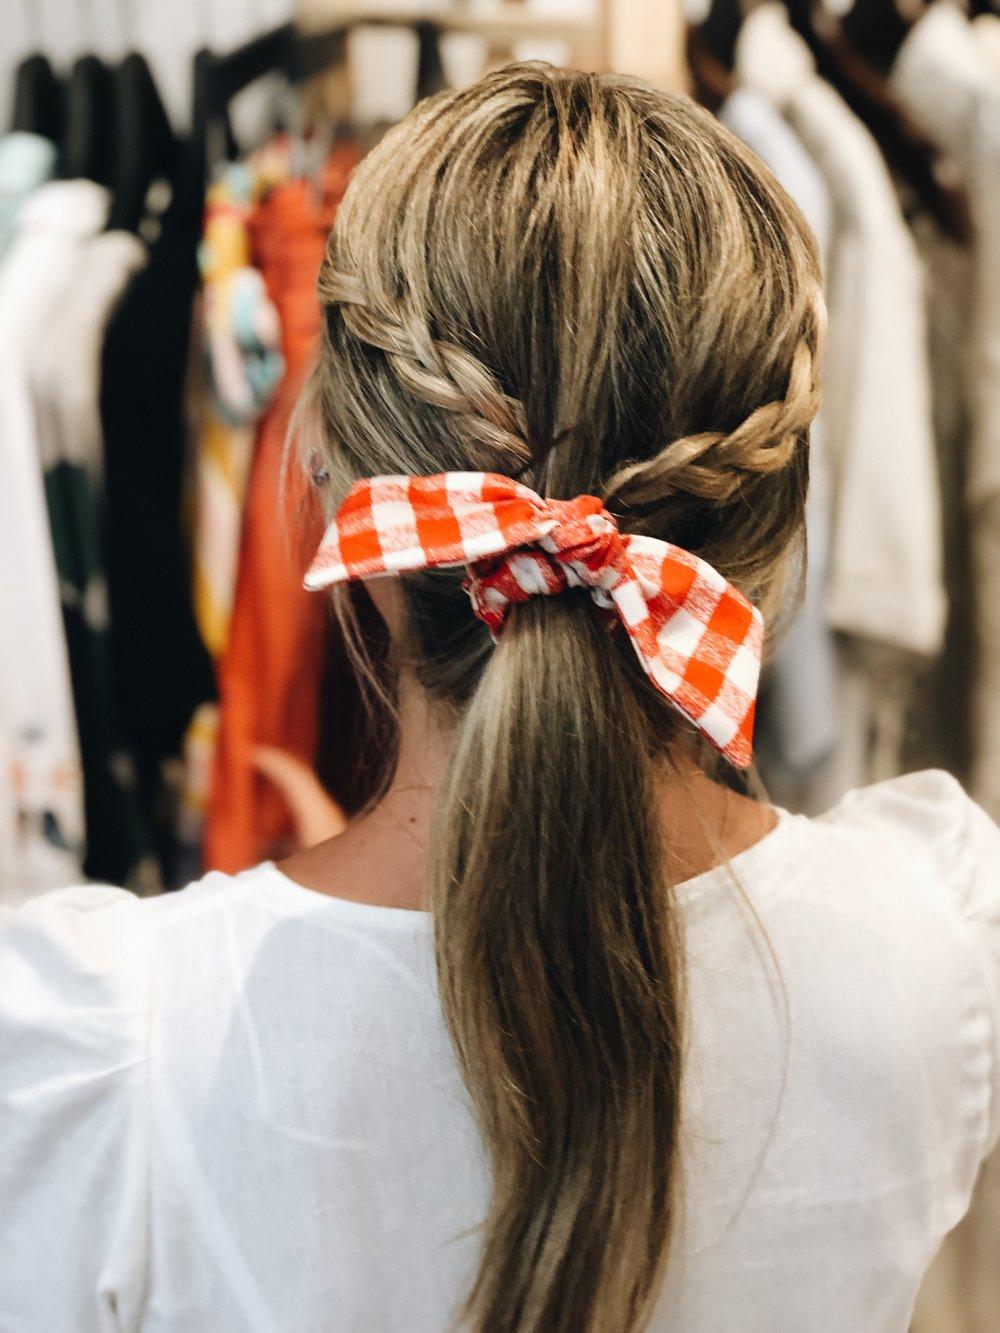 Hair style by Isa Kraco